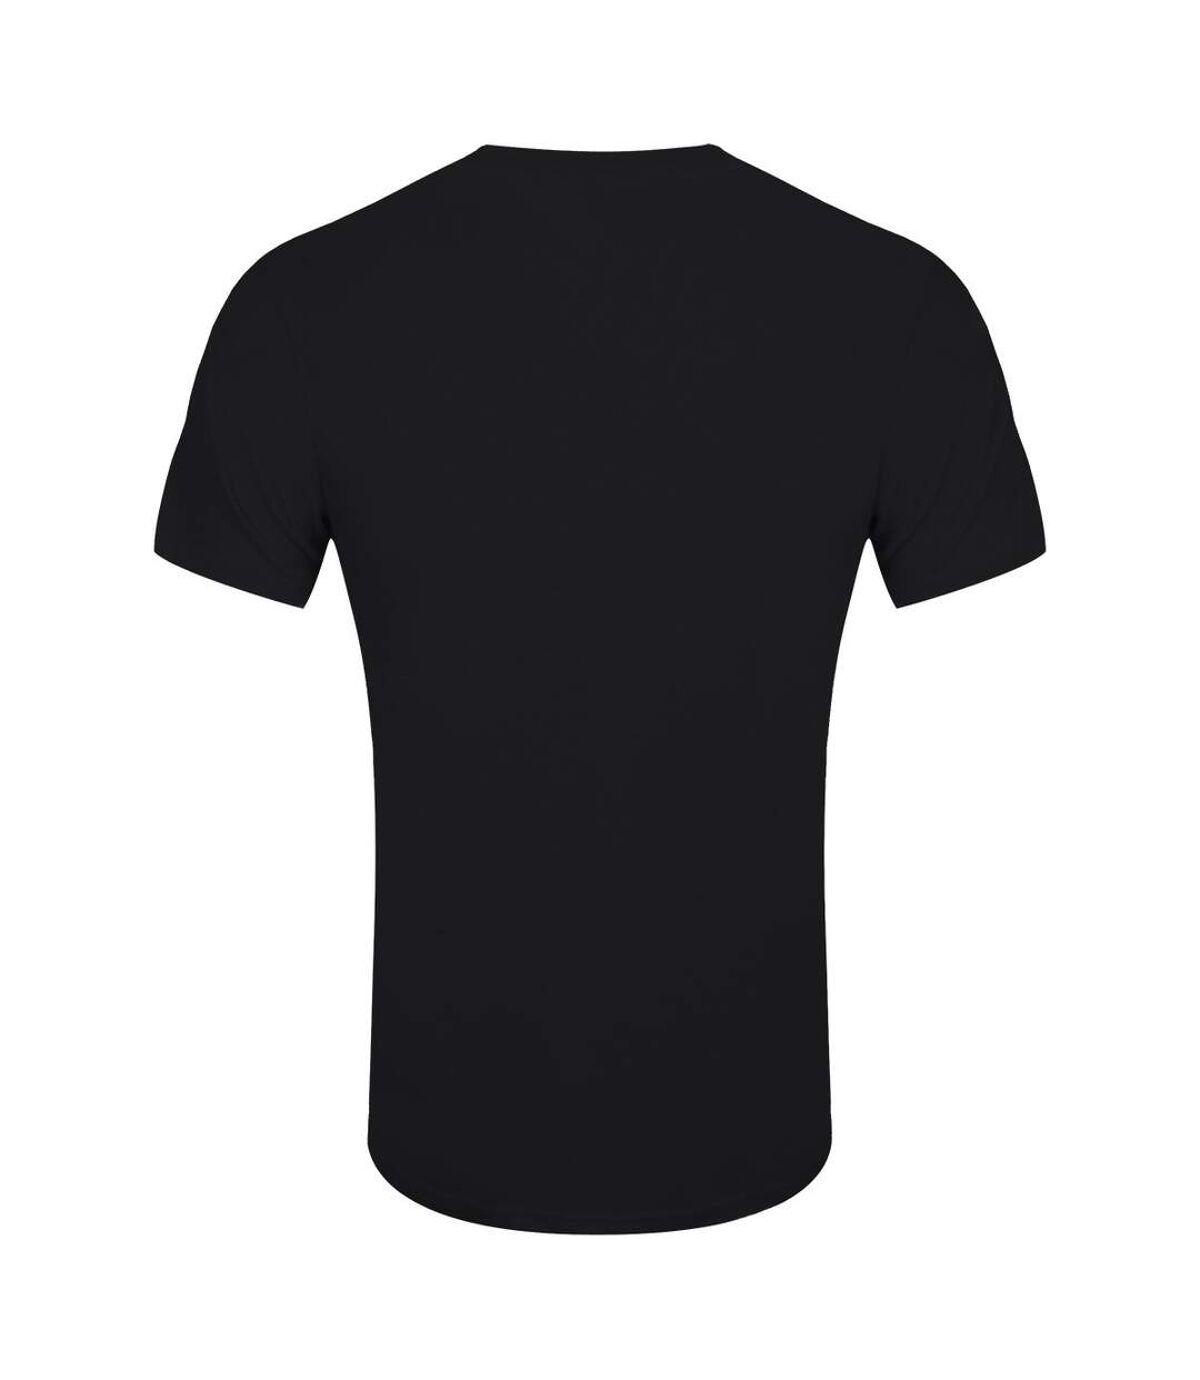 Grindstore Mens Pretty Sus! T-Shirt (Black/Red/Purple) - UTGR4840